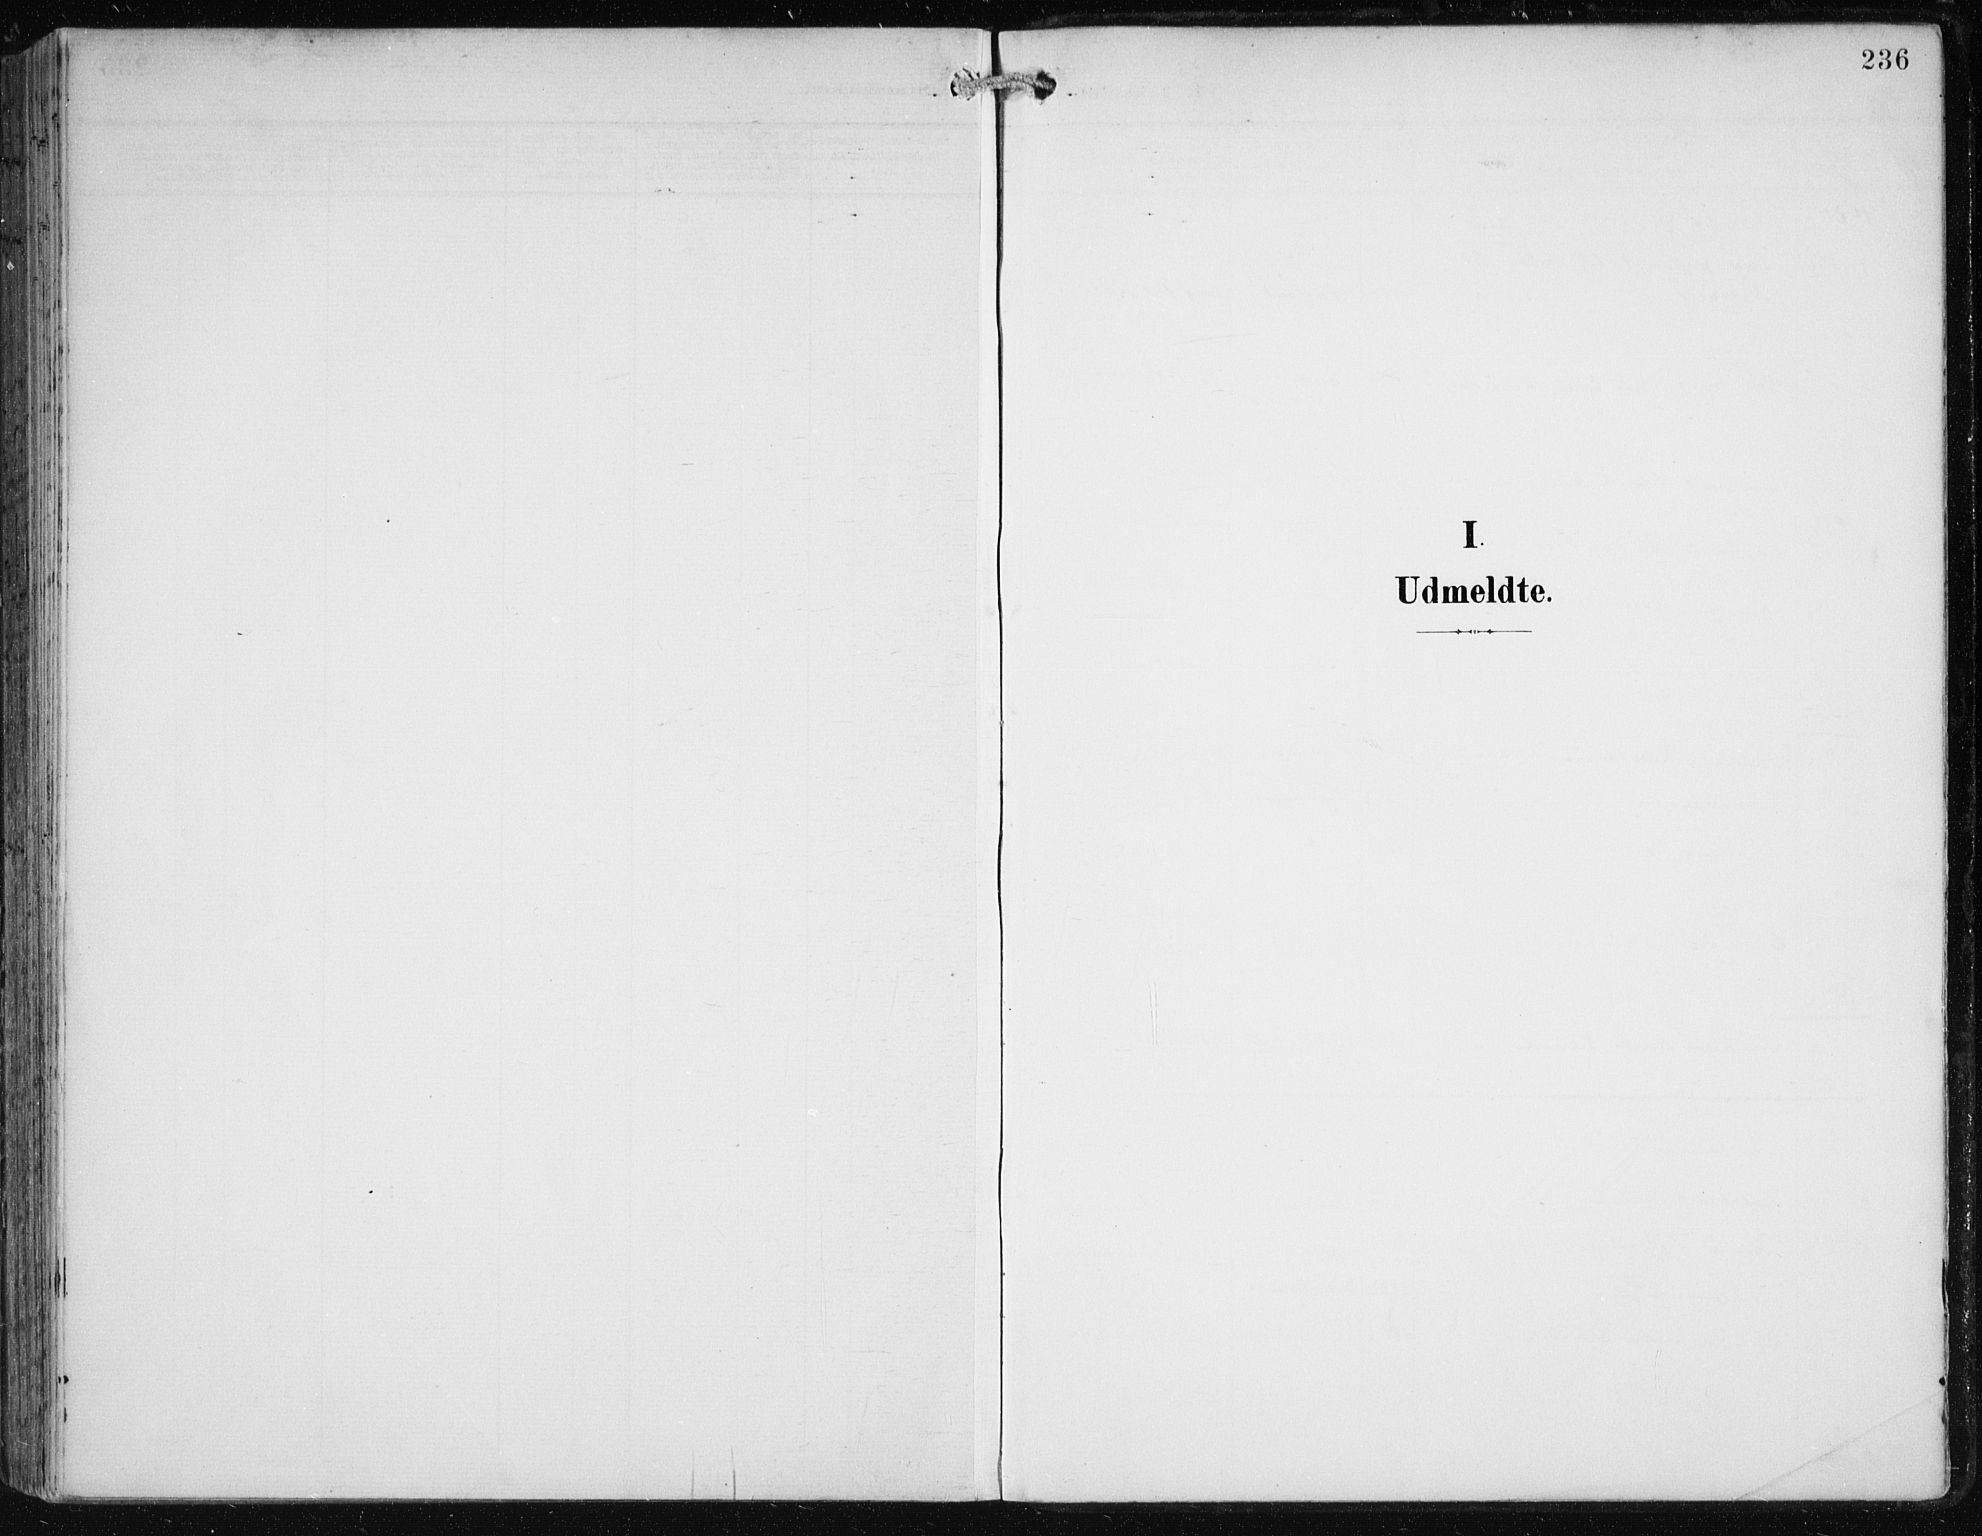 SAB, Fana Sokneprestembete, H/Haa/Haai/L0003: Parish register (official) no. I 3, 1900-1912, p. 236